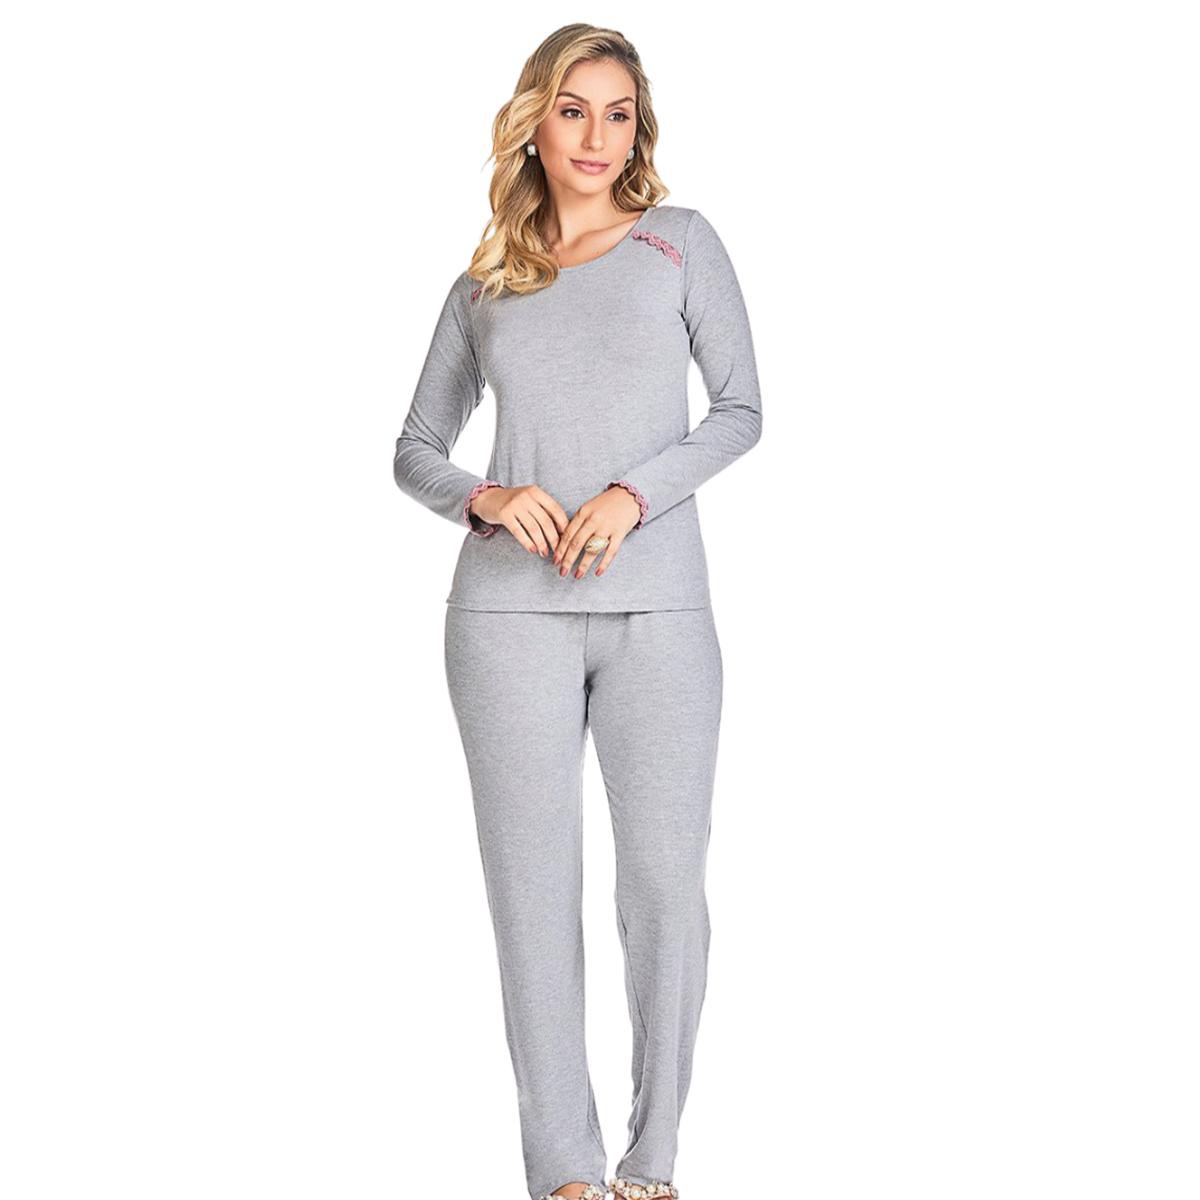 Pijama feminino inverno mescla detalhes manga